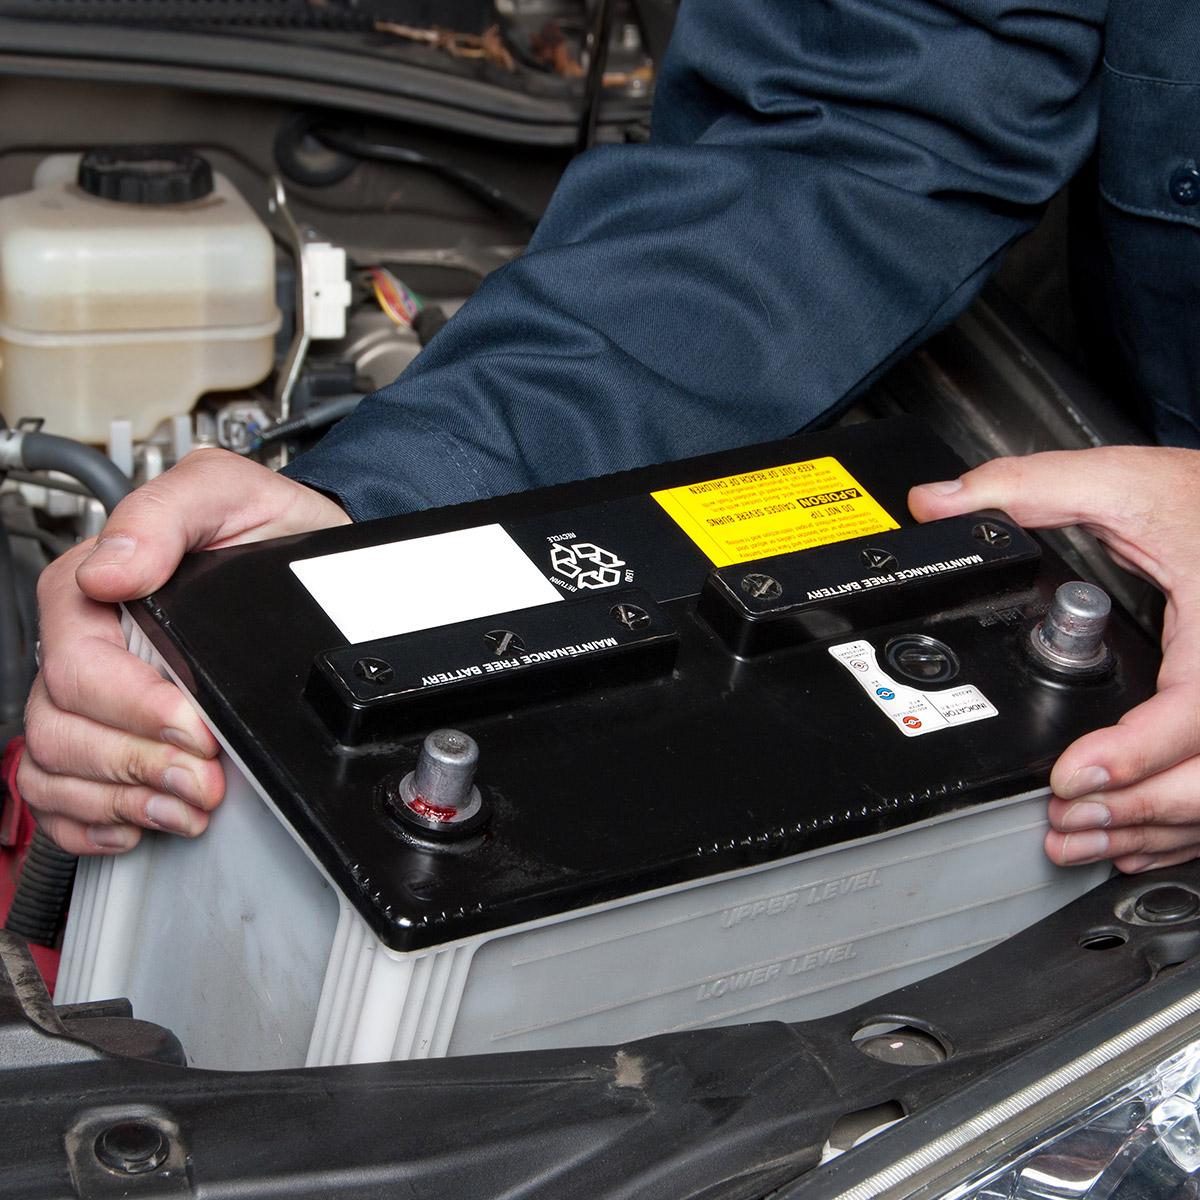 Ford Focus Battery Replacement Costs Repairs Autoguru